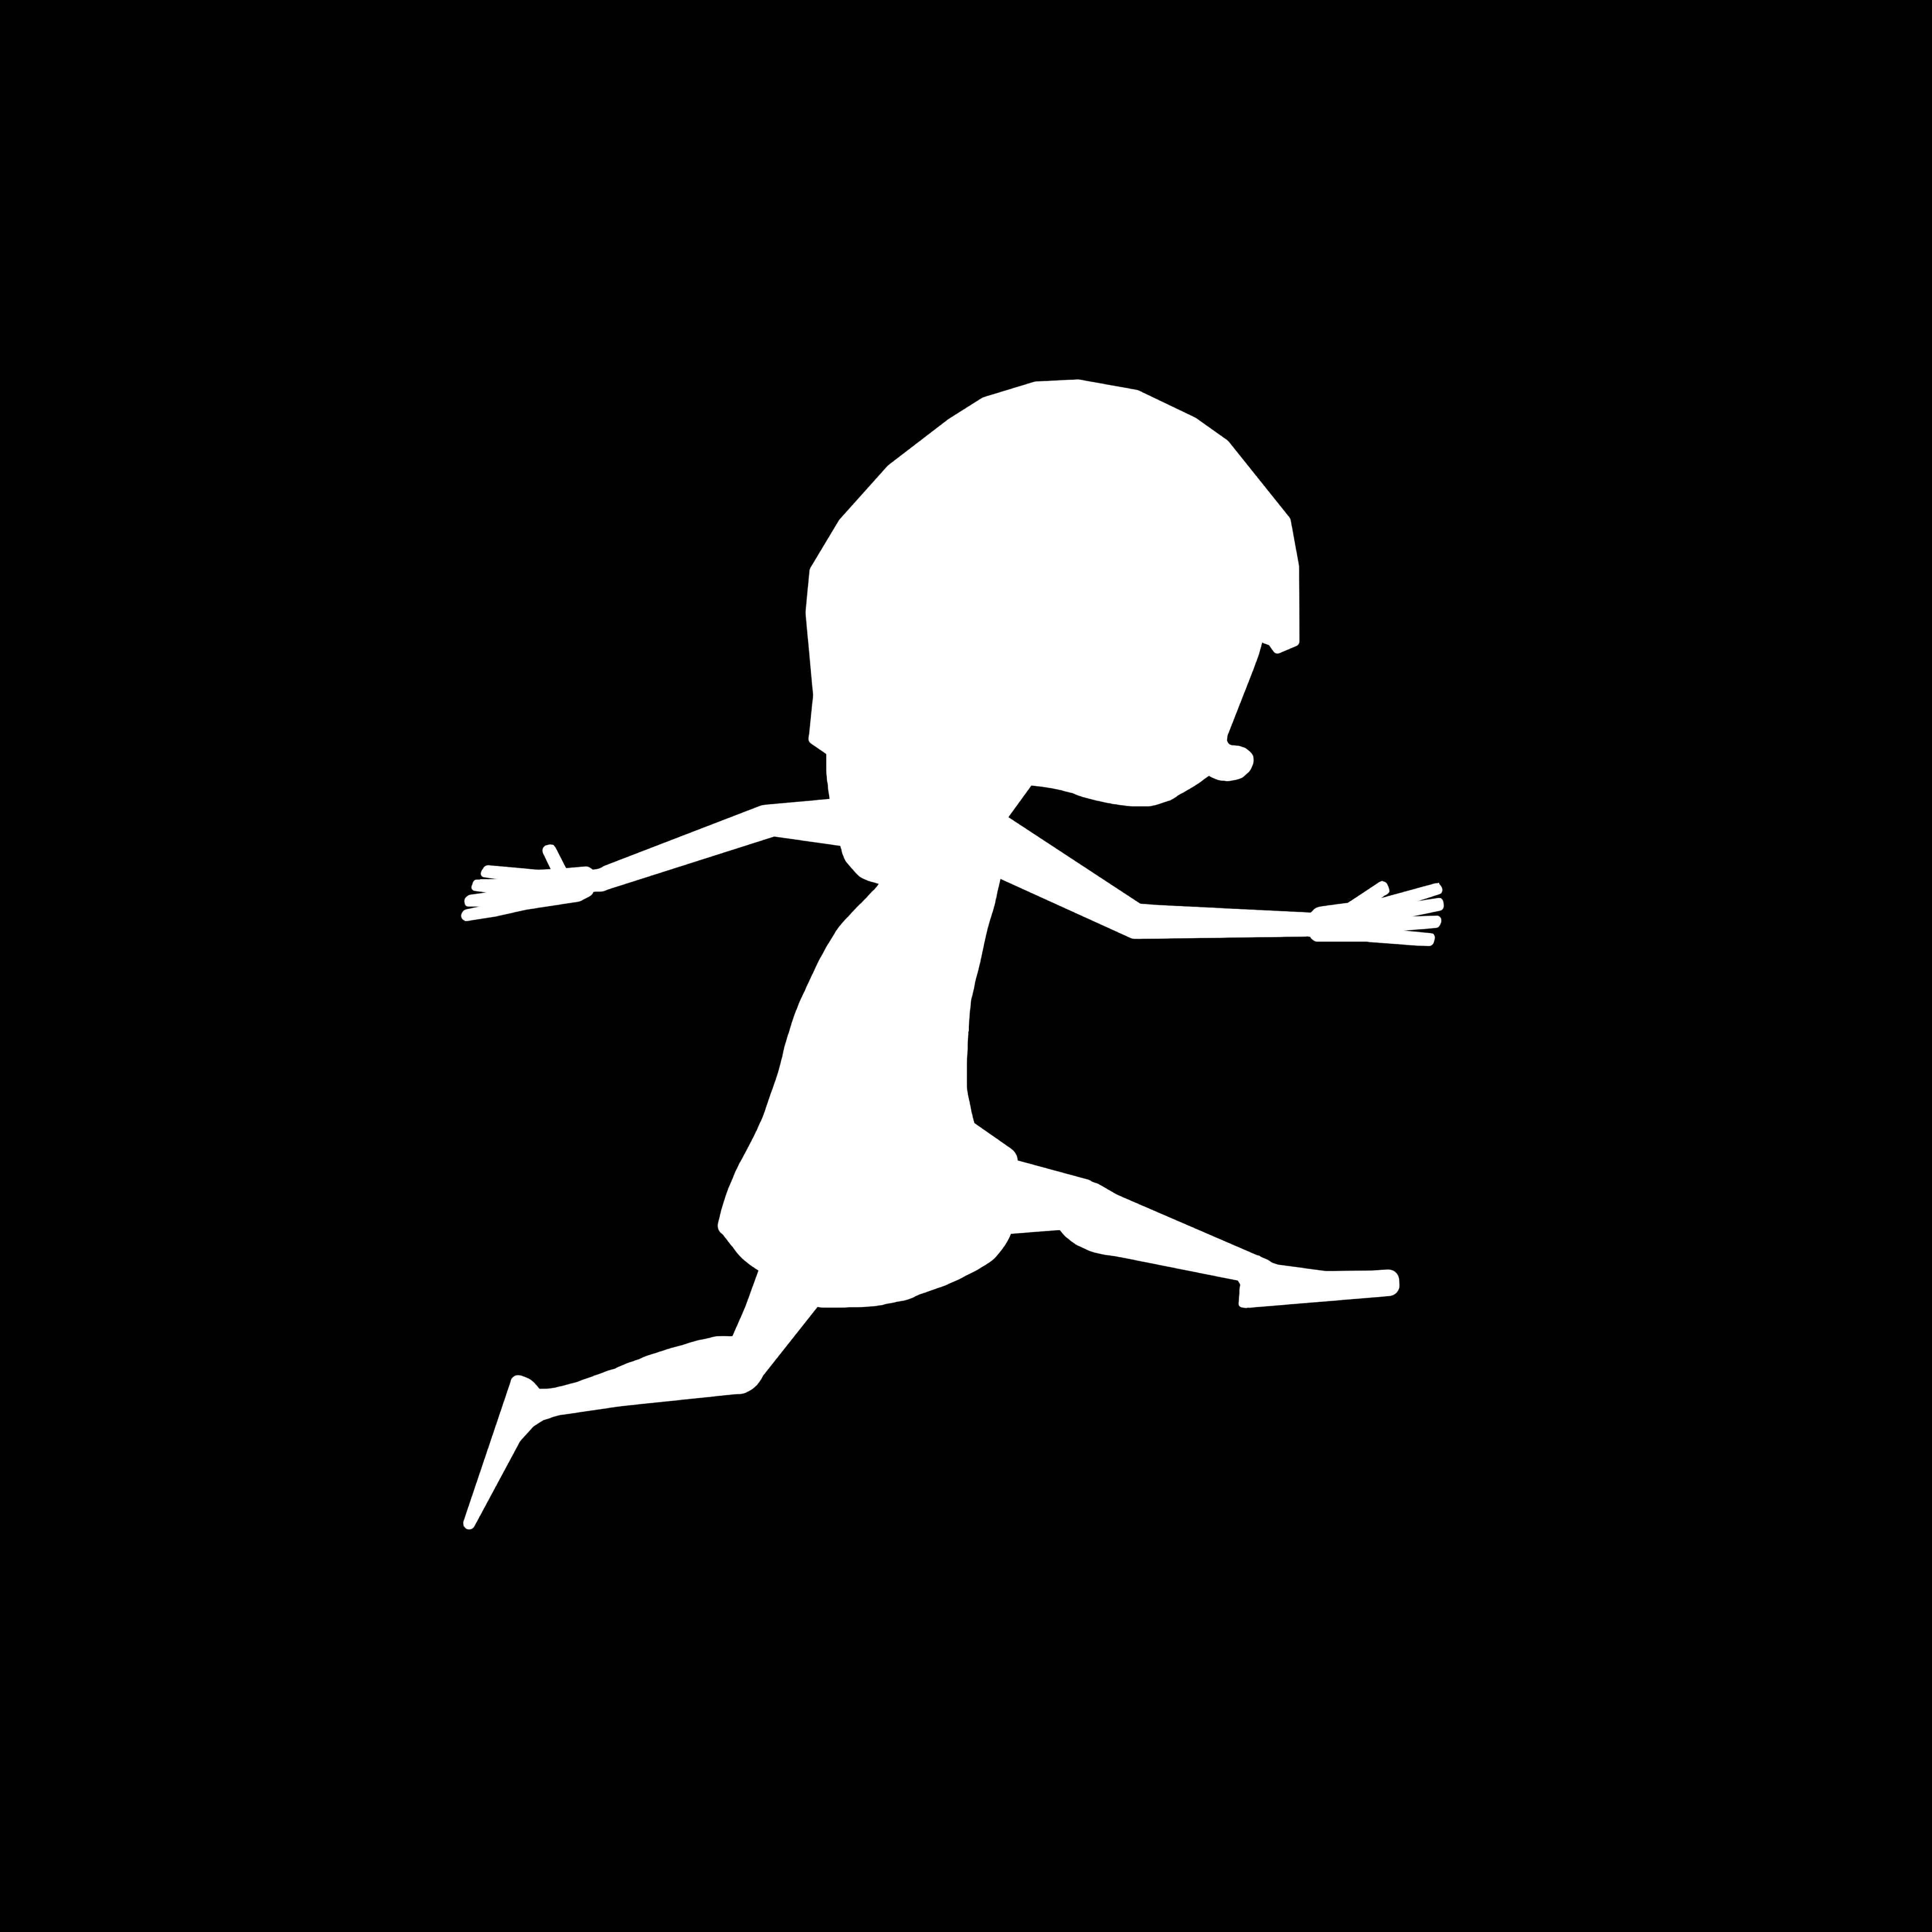 A Juggler's Tale (ajugglerstale) Profile Image | Linktree